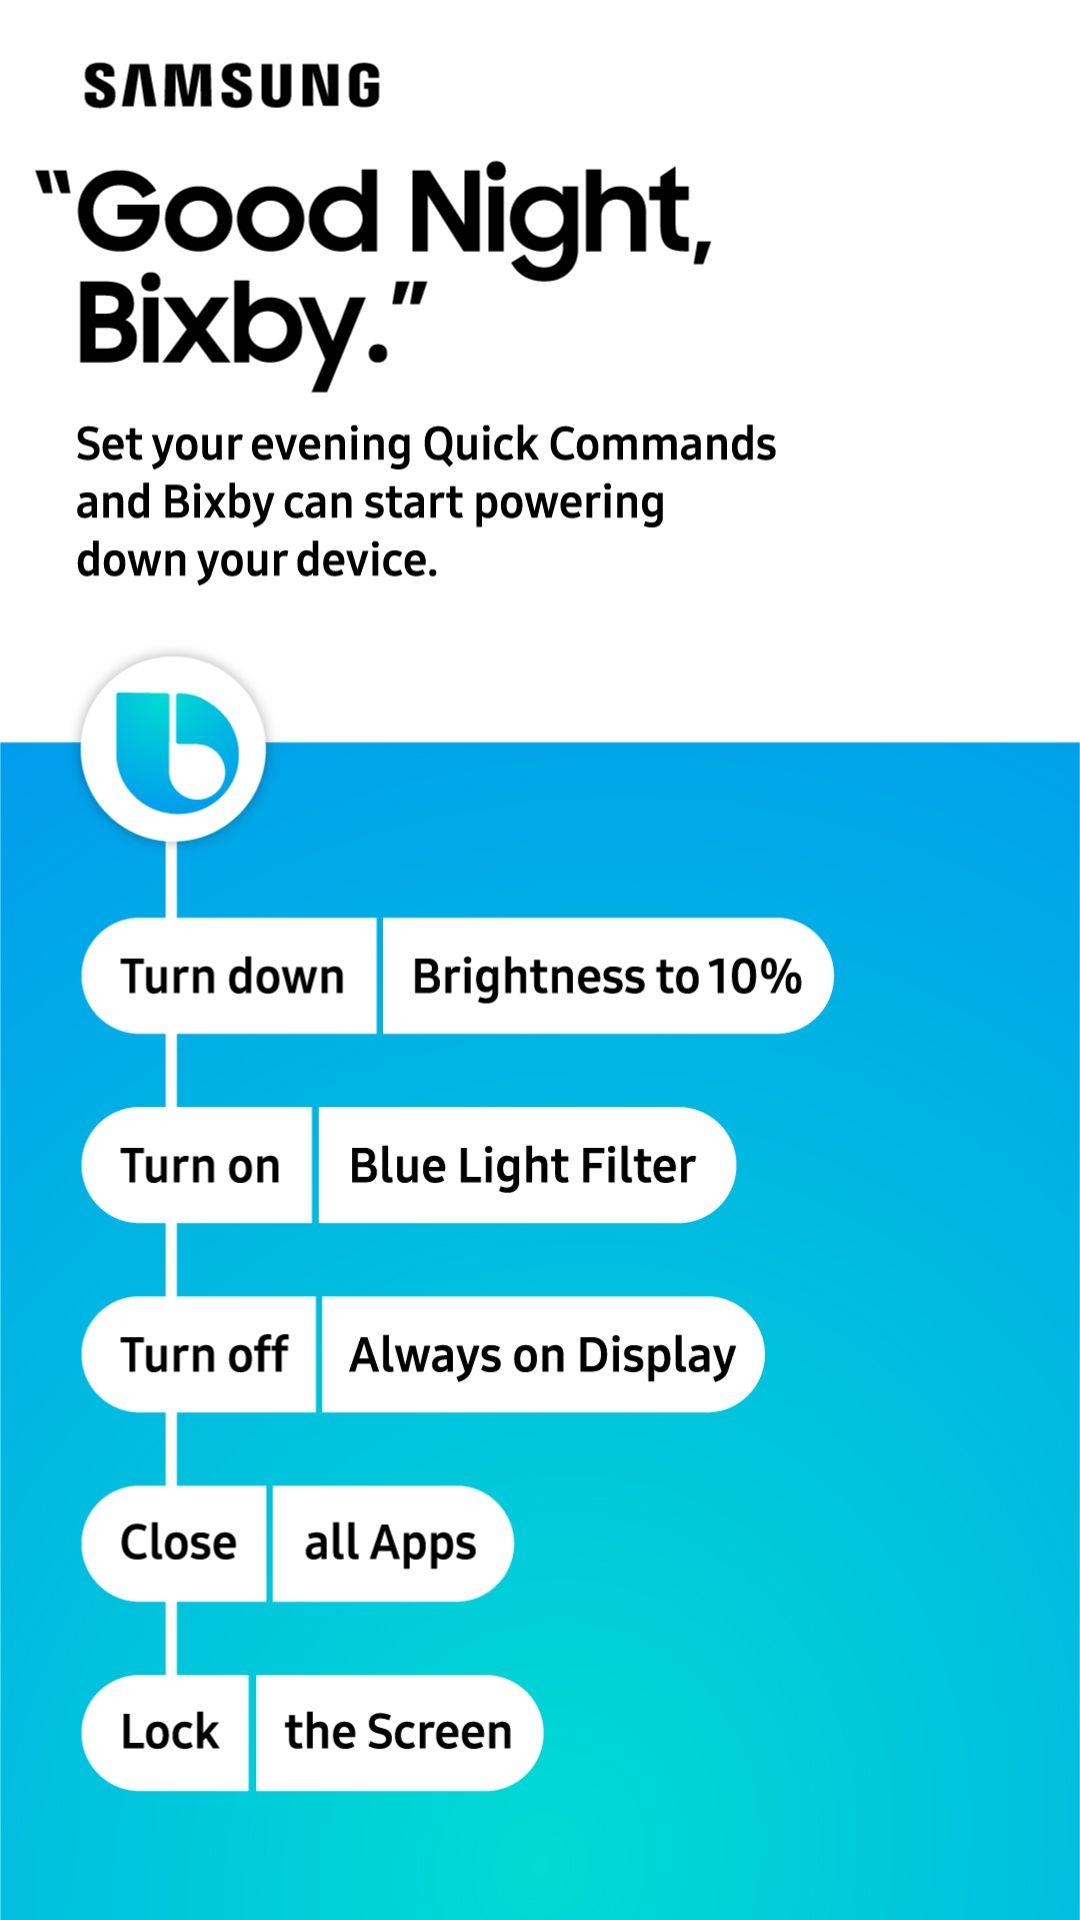 Pjs Brush Teeth Good Night Bixby Your Samsung Mobile Device